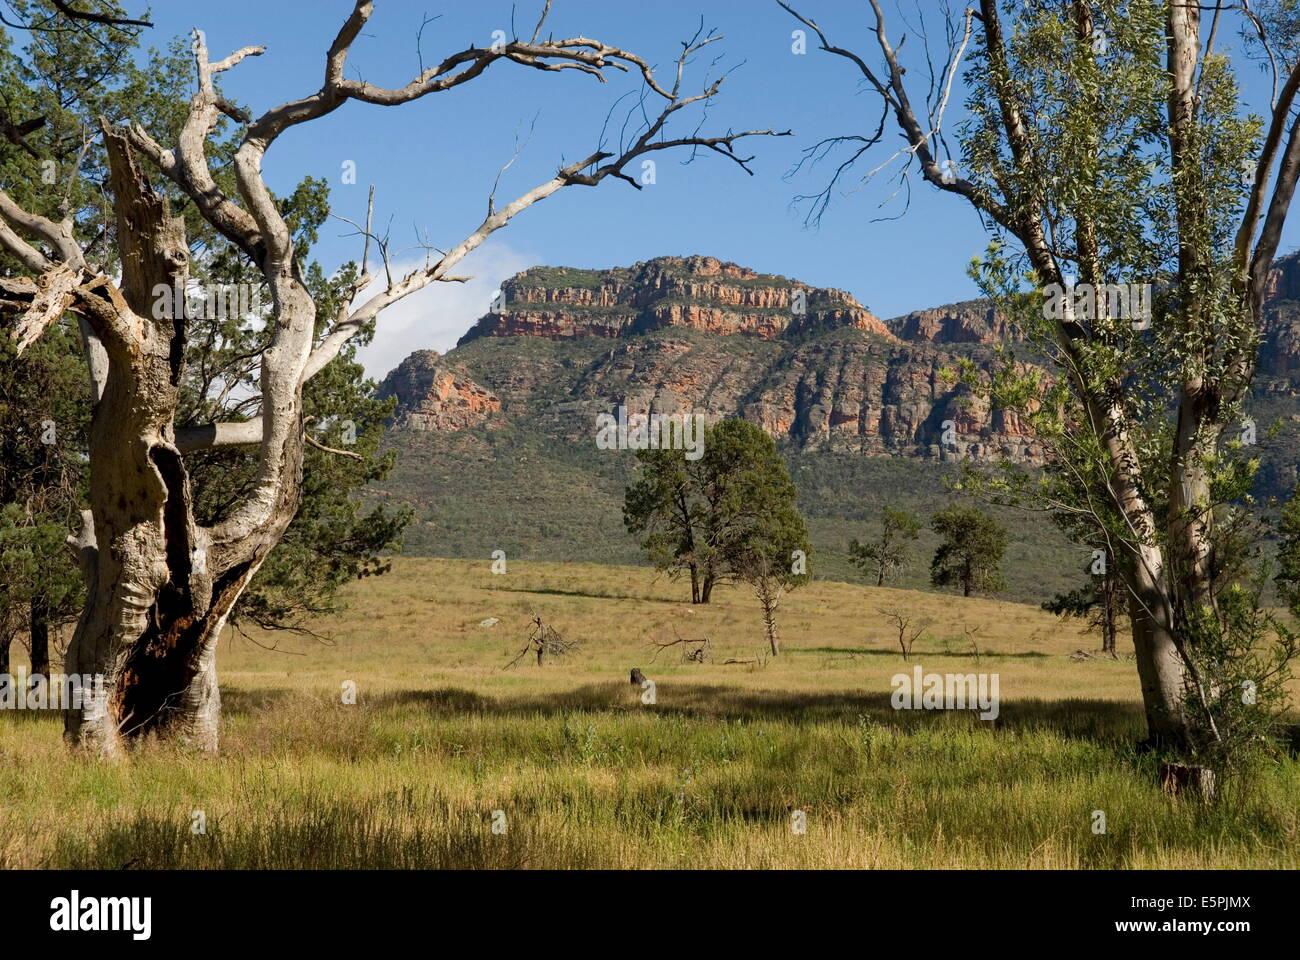 Sandstone escarpment above Wilpuna Valley, Flinders Ranges National Park, South Australia, Australia, Pacific - Stock Image